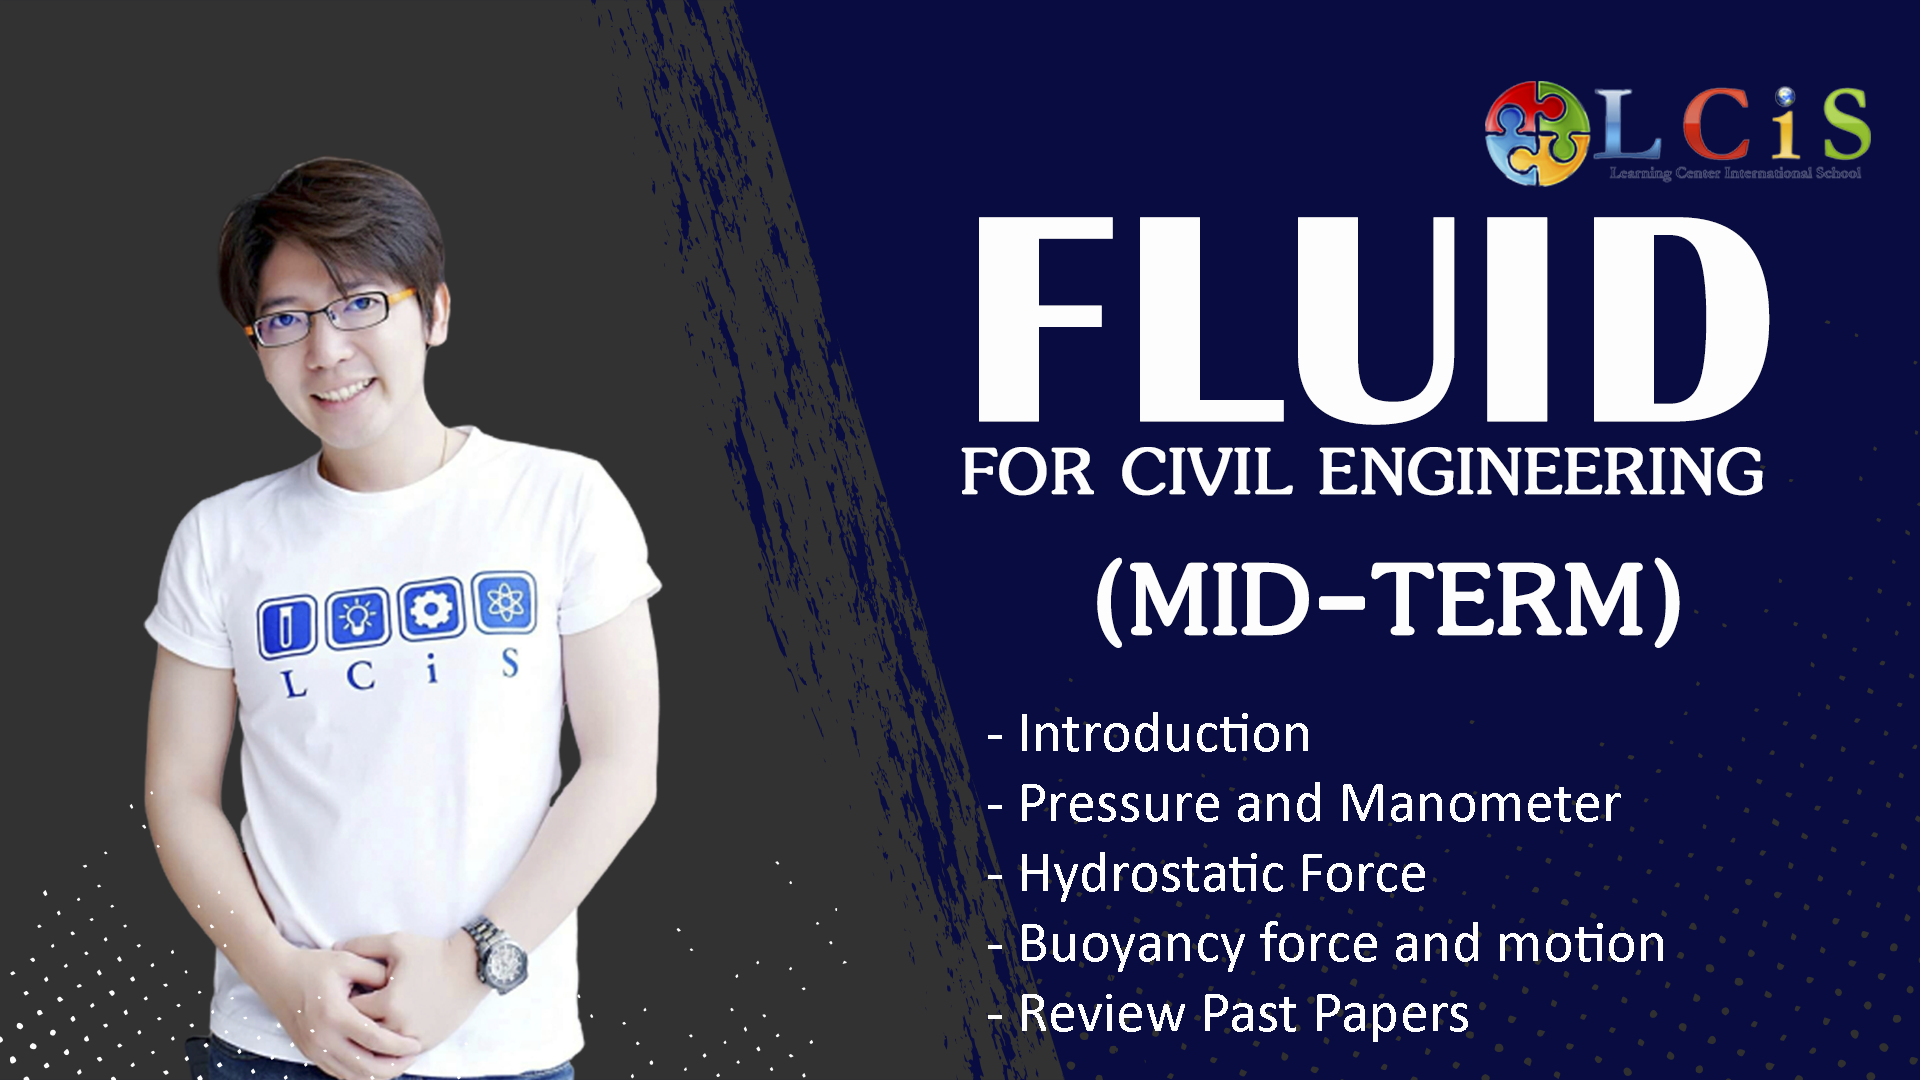 Fluid for Civil Engineering (CE) - Mid Term